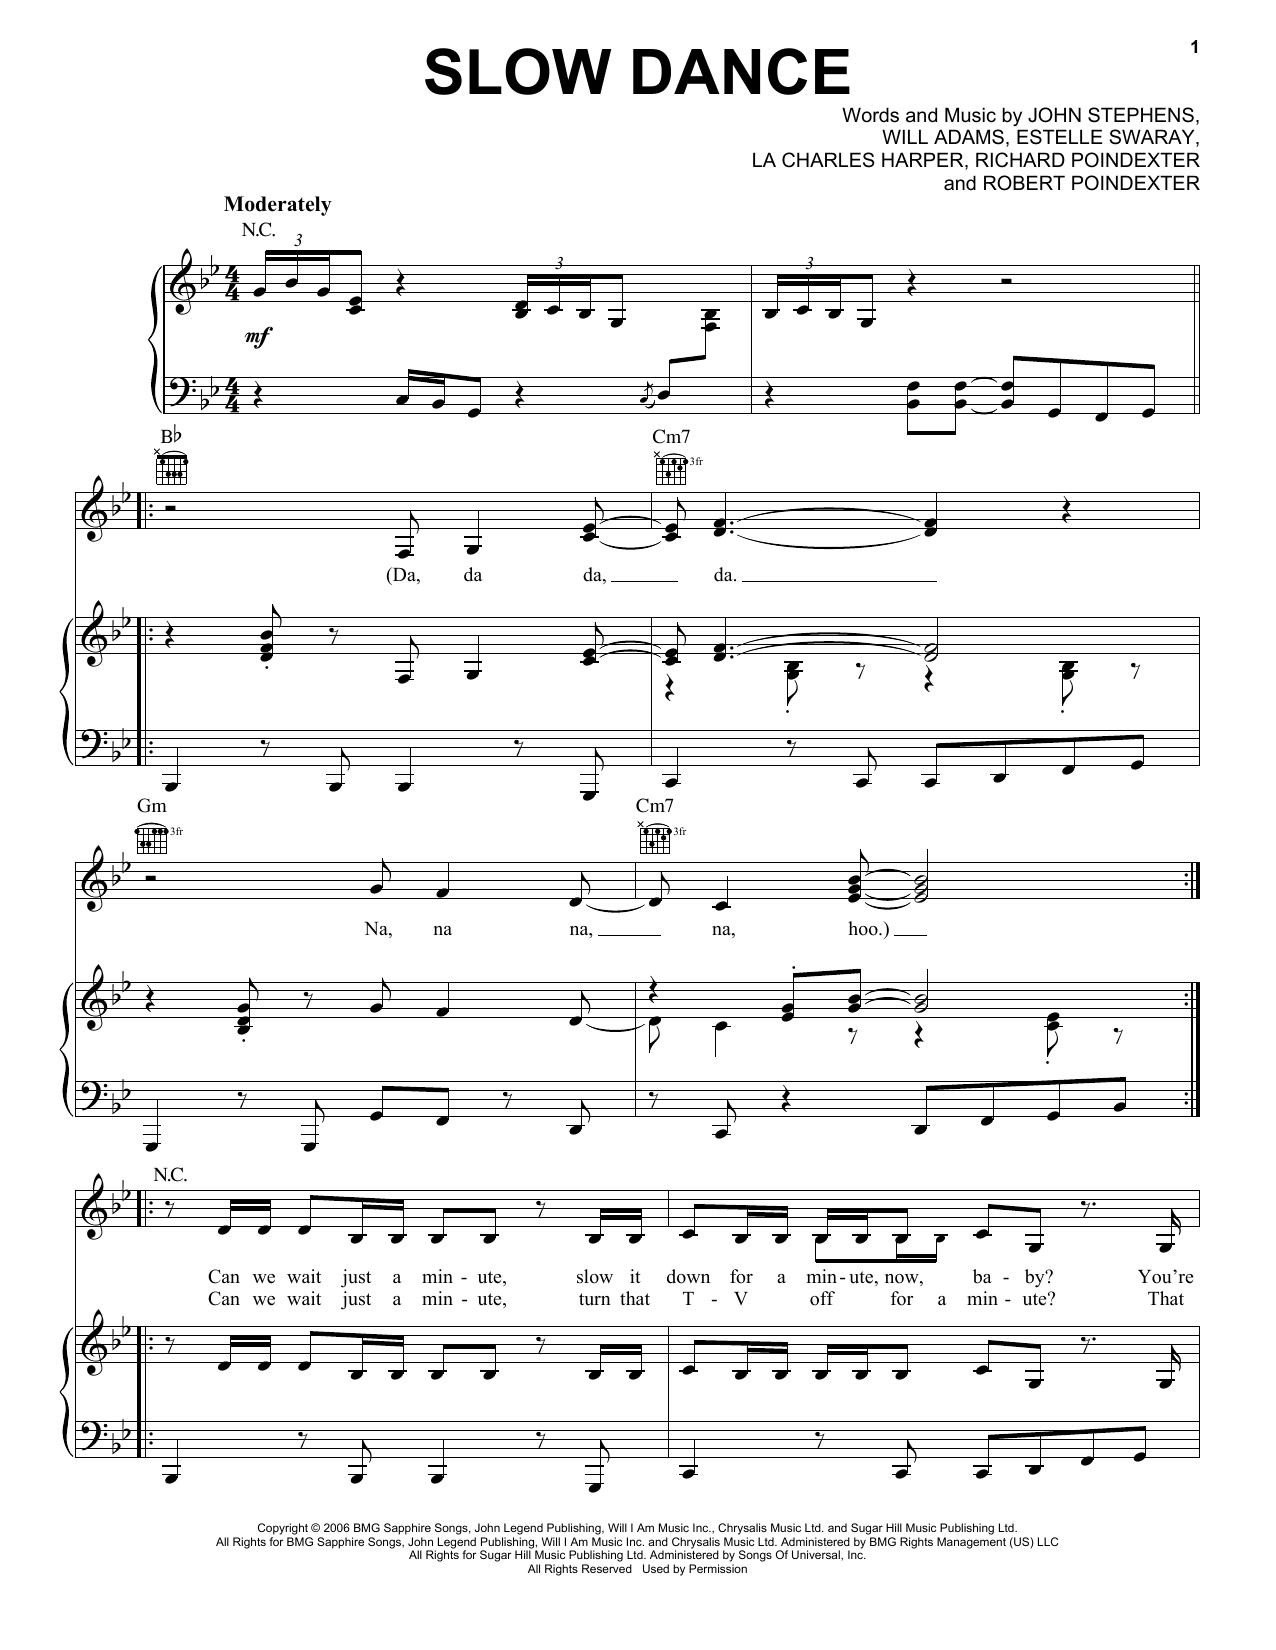 Slow Dance sheet music